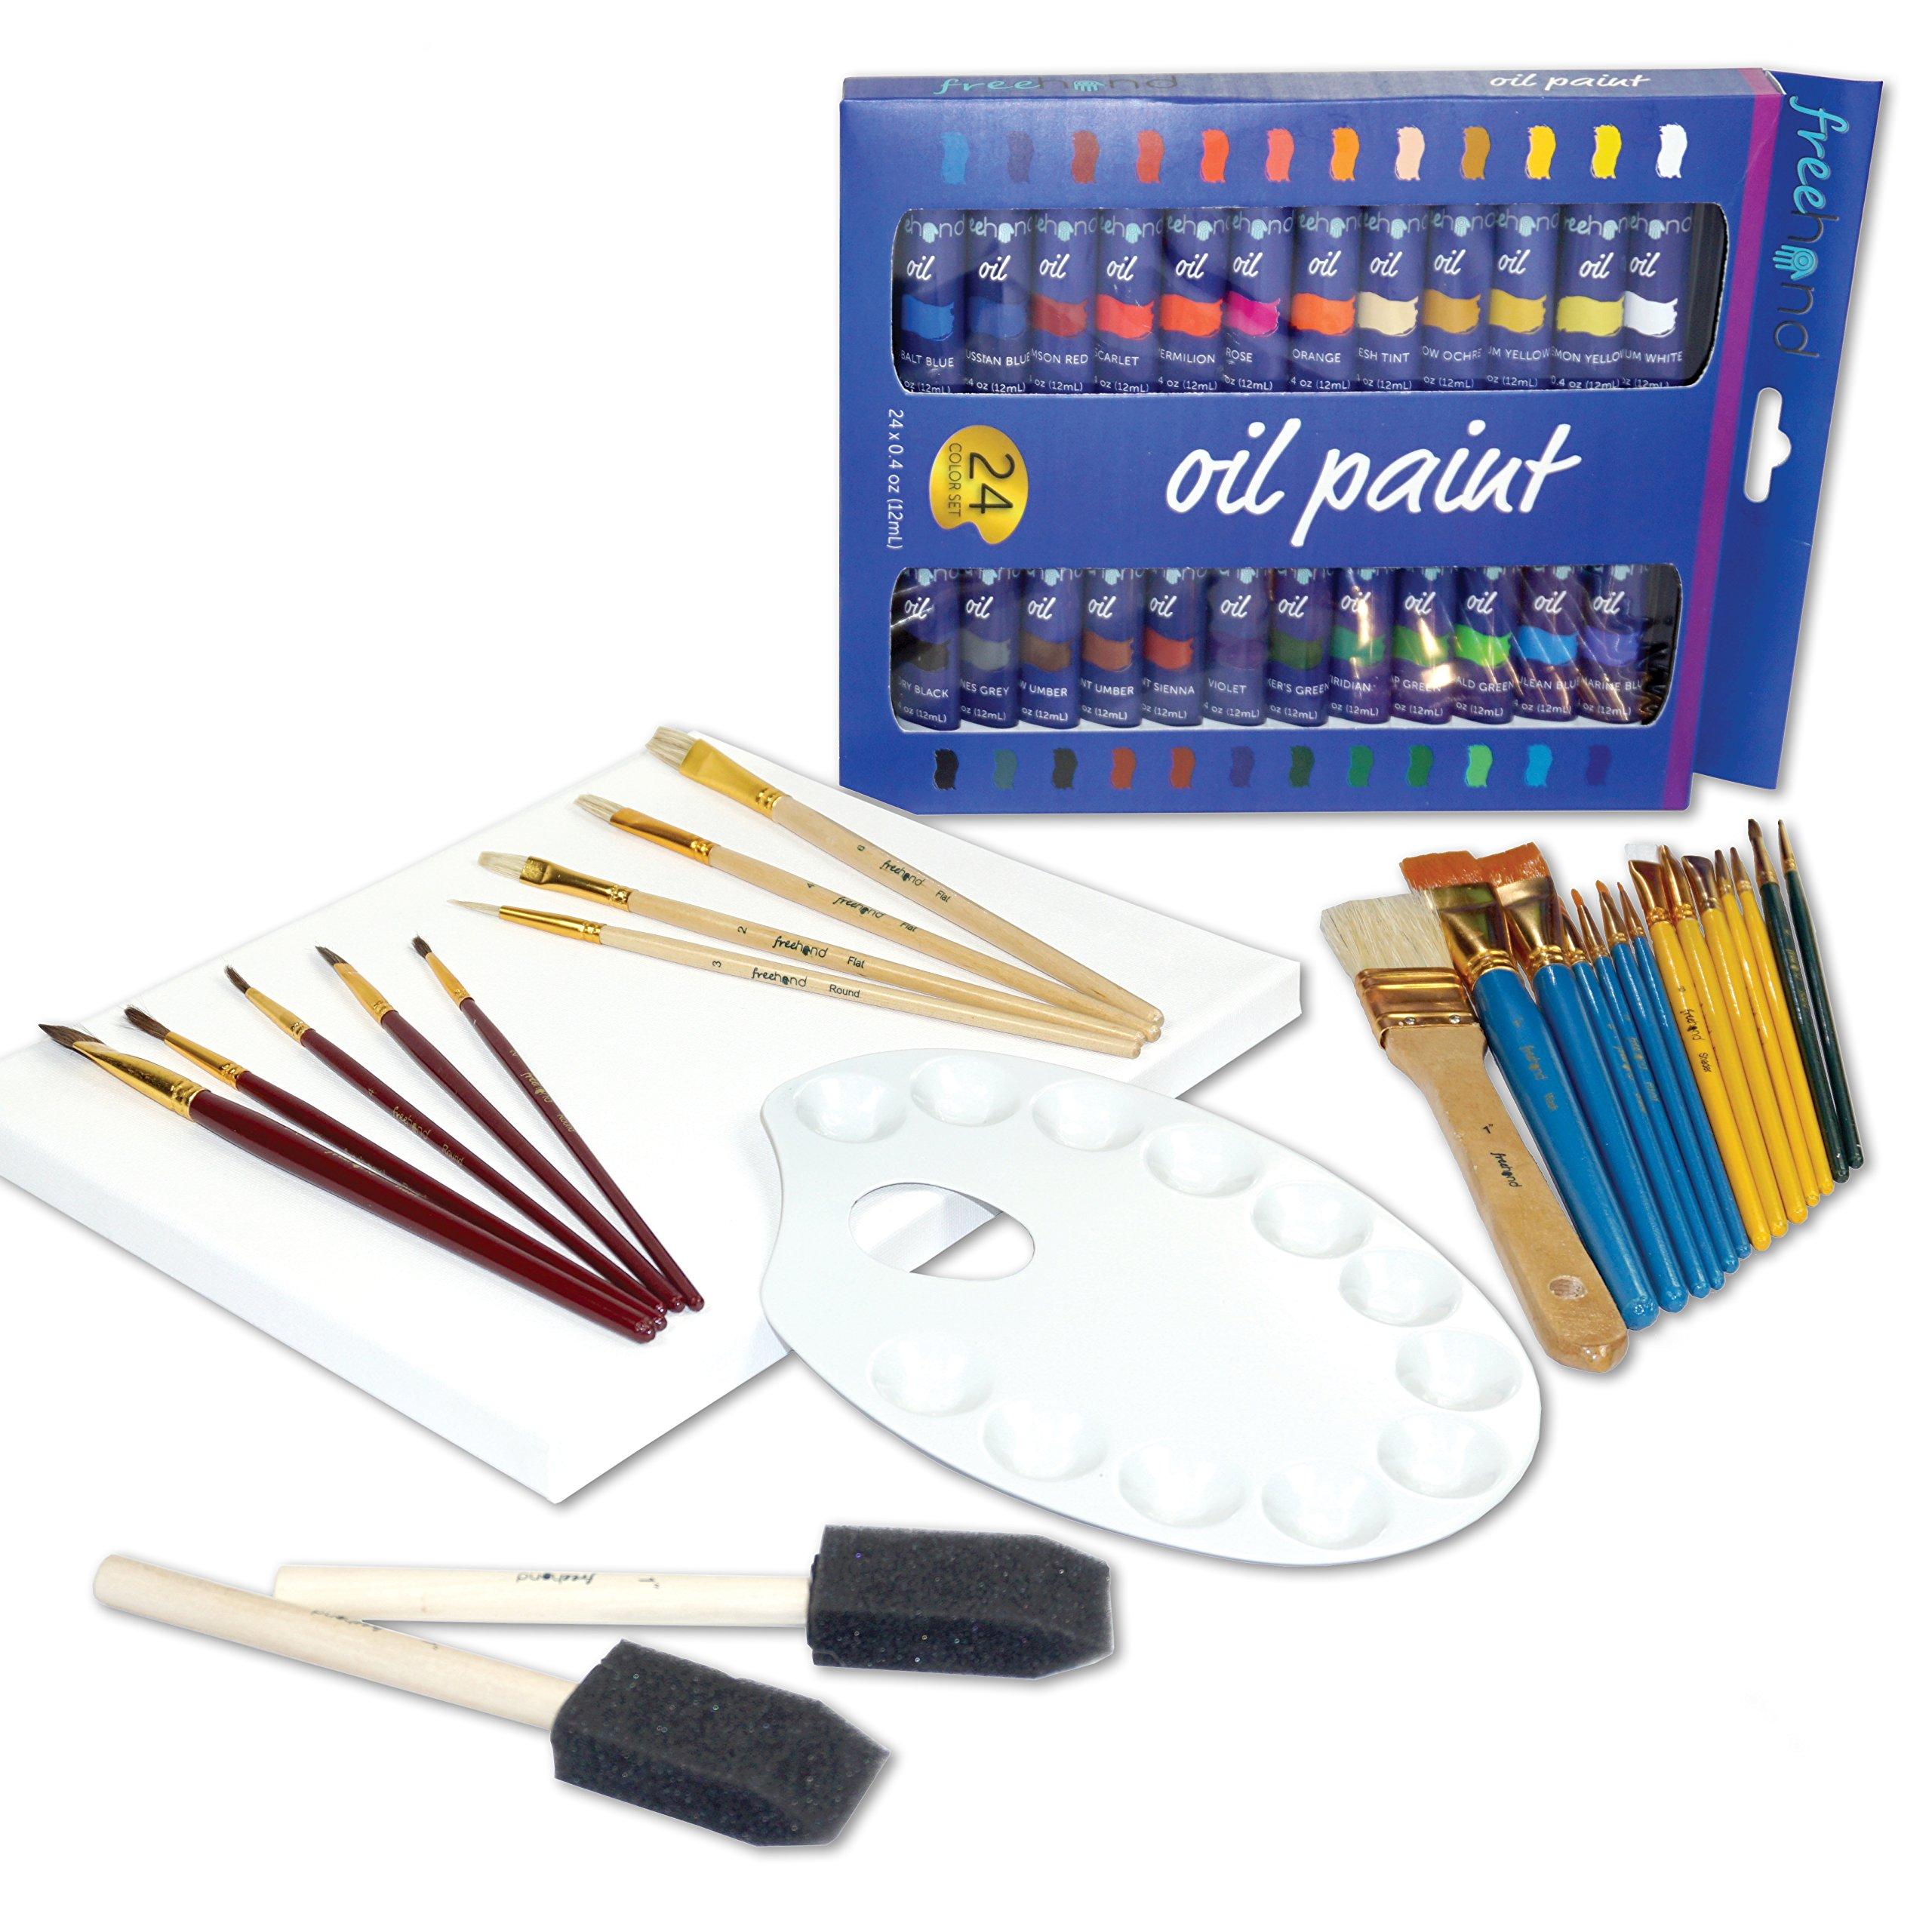 Oil Painting Deluxe Art Set - 24 Oil Paint Set - 25 Paint Brushes - Painting Canvas - Paint Palette - Art Supplies for Teens, Adults & Kids